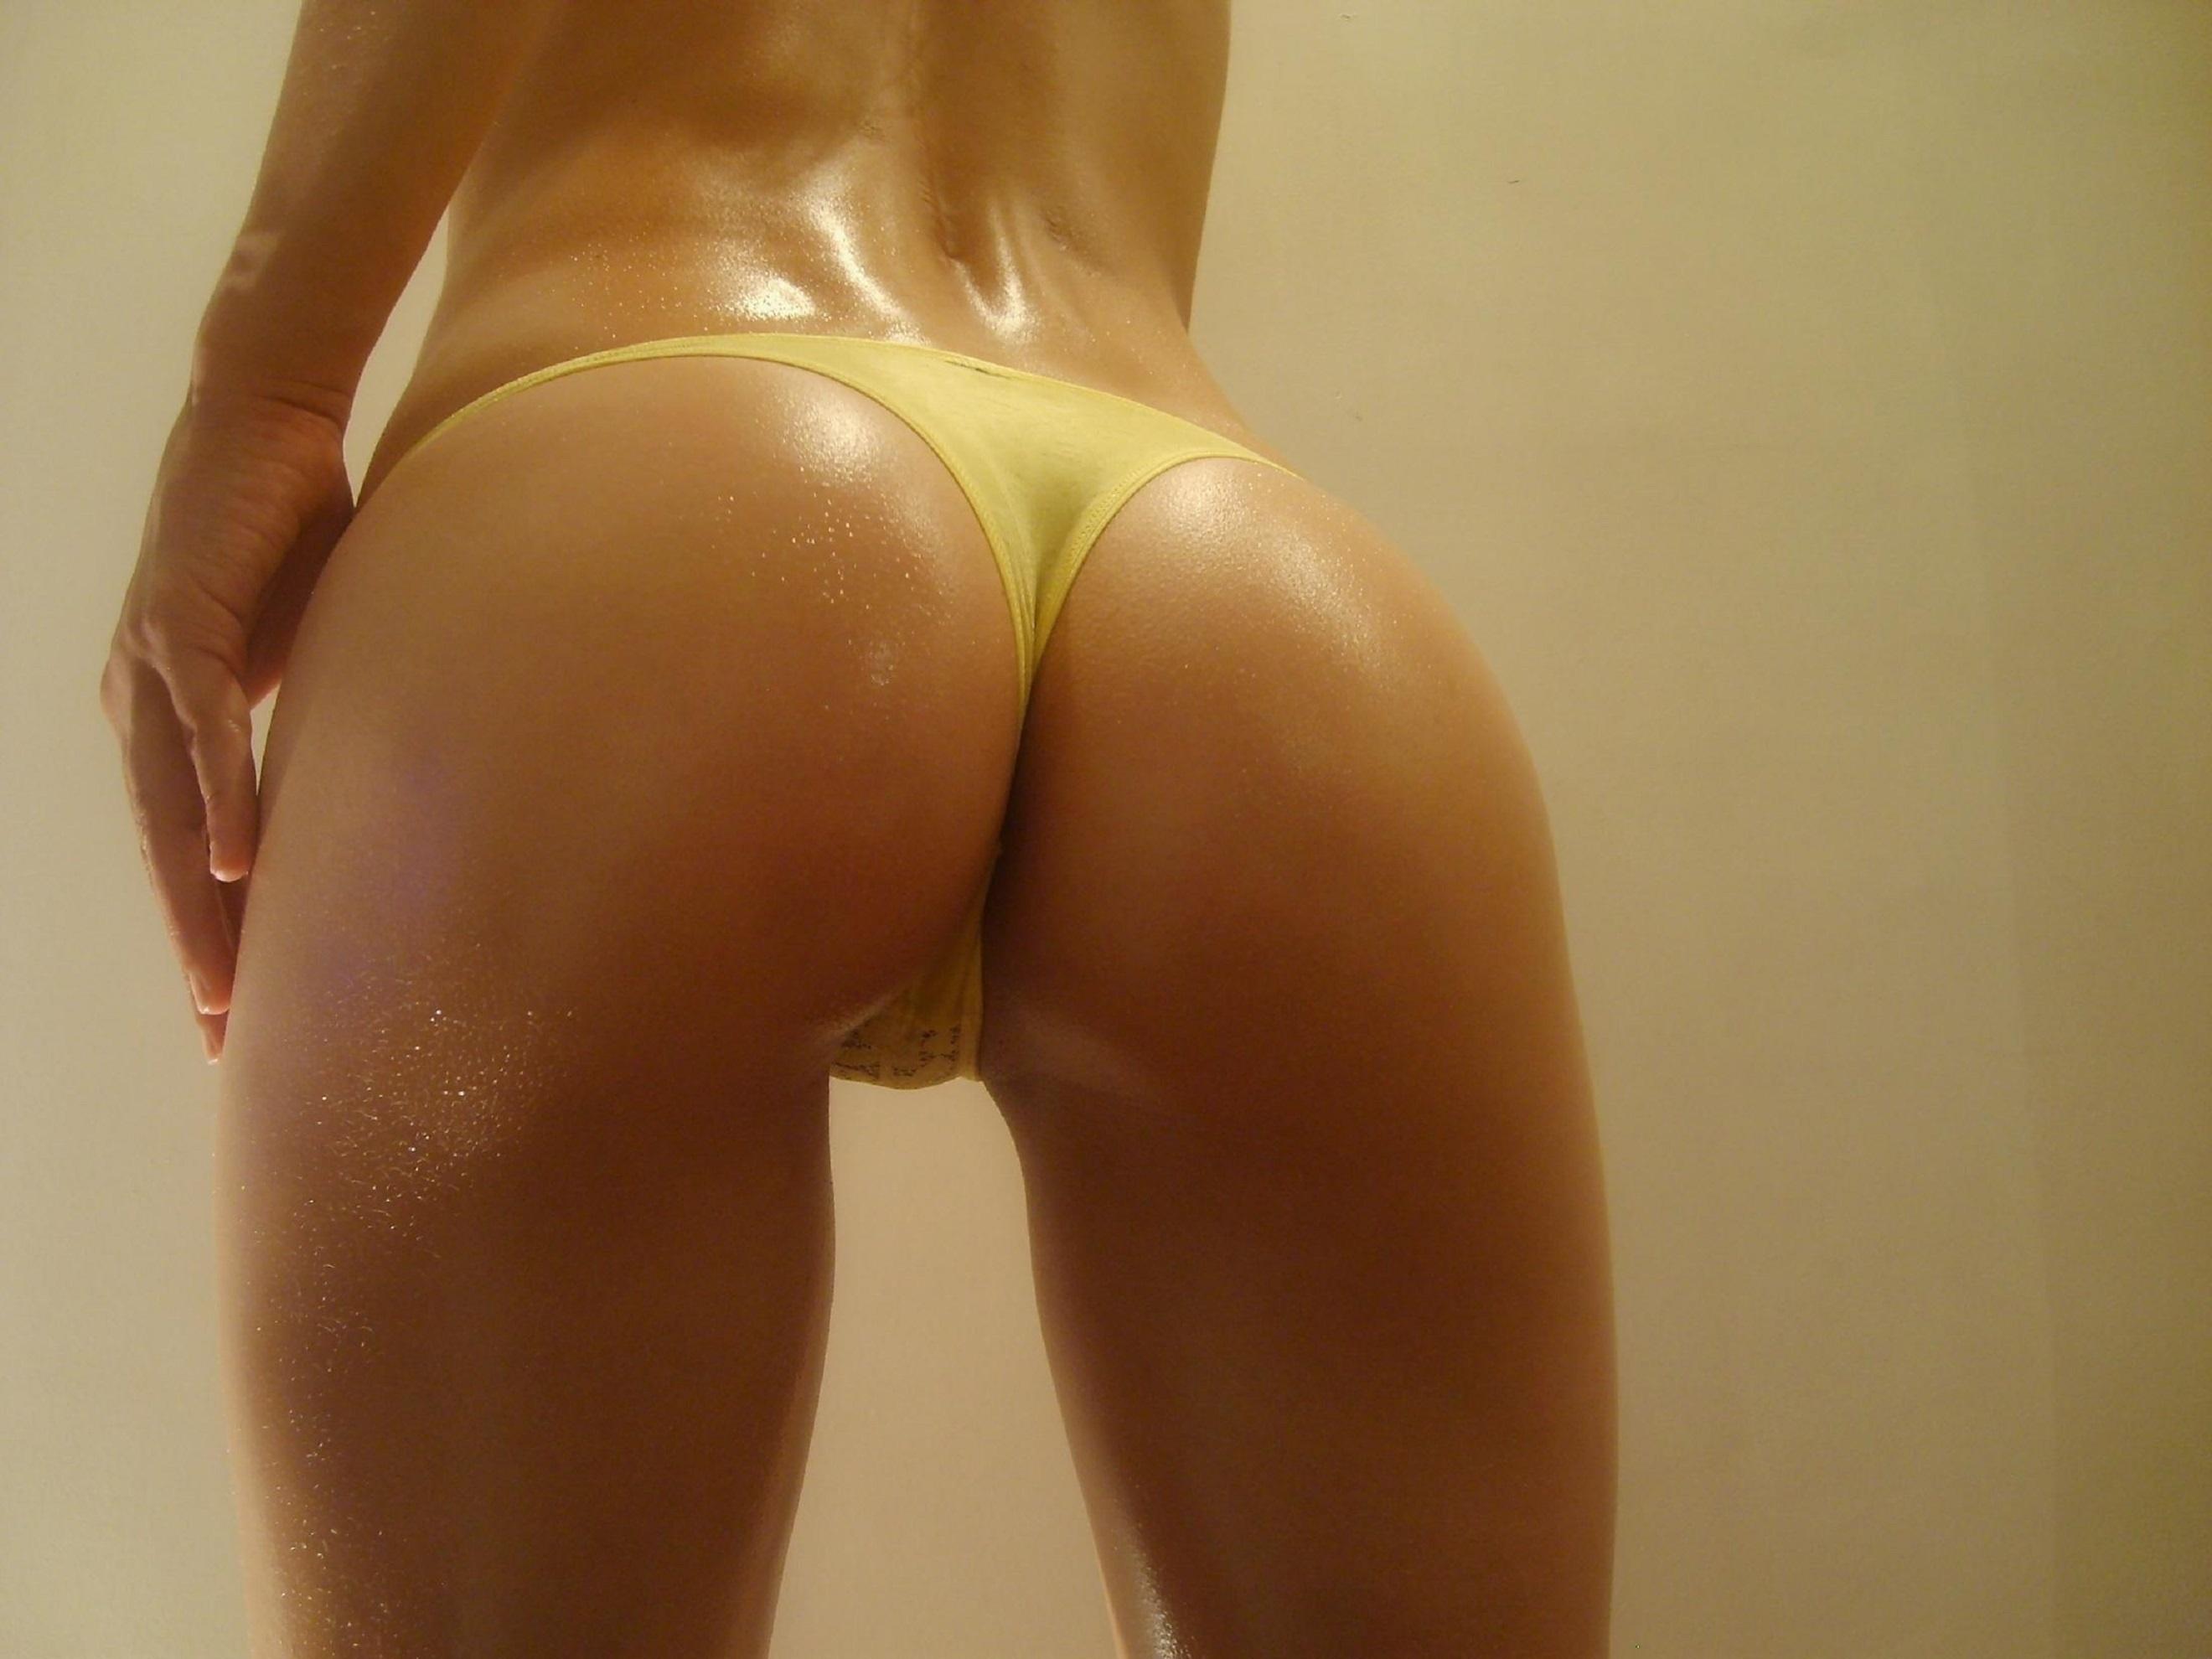 Katy segal nude